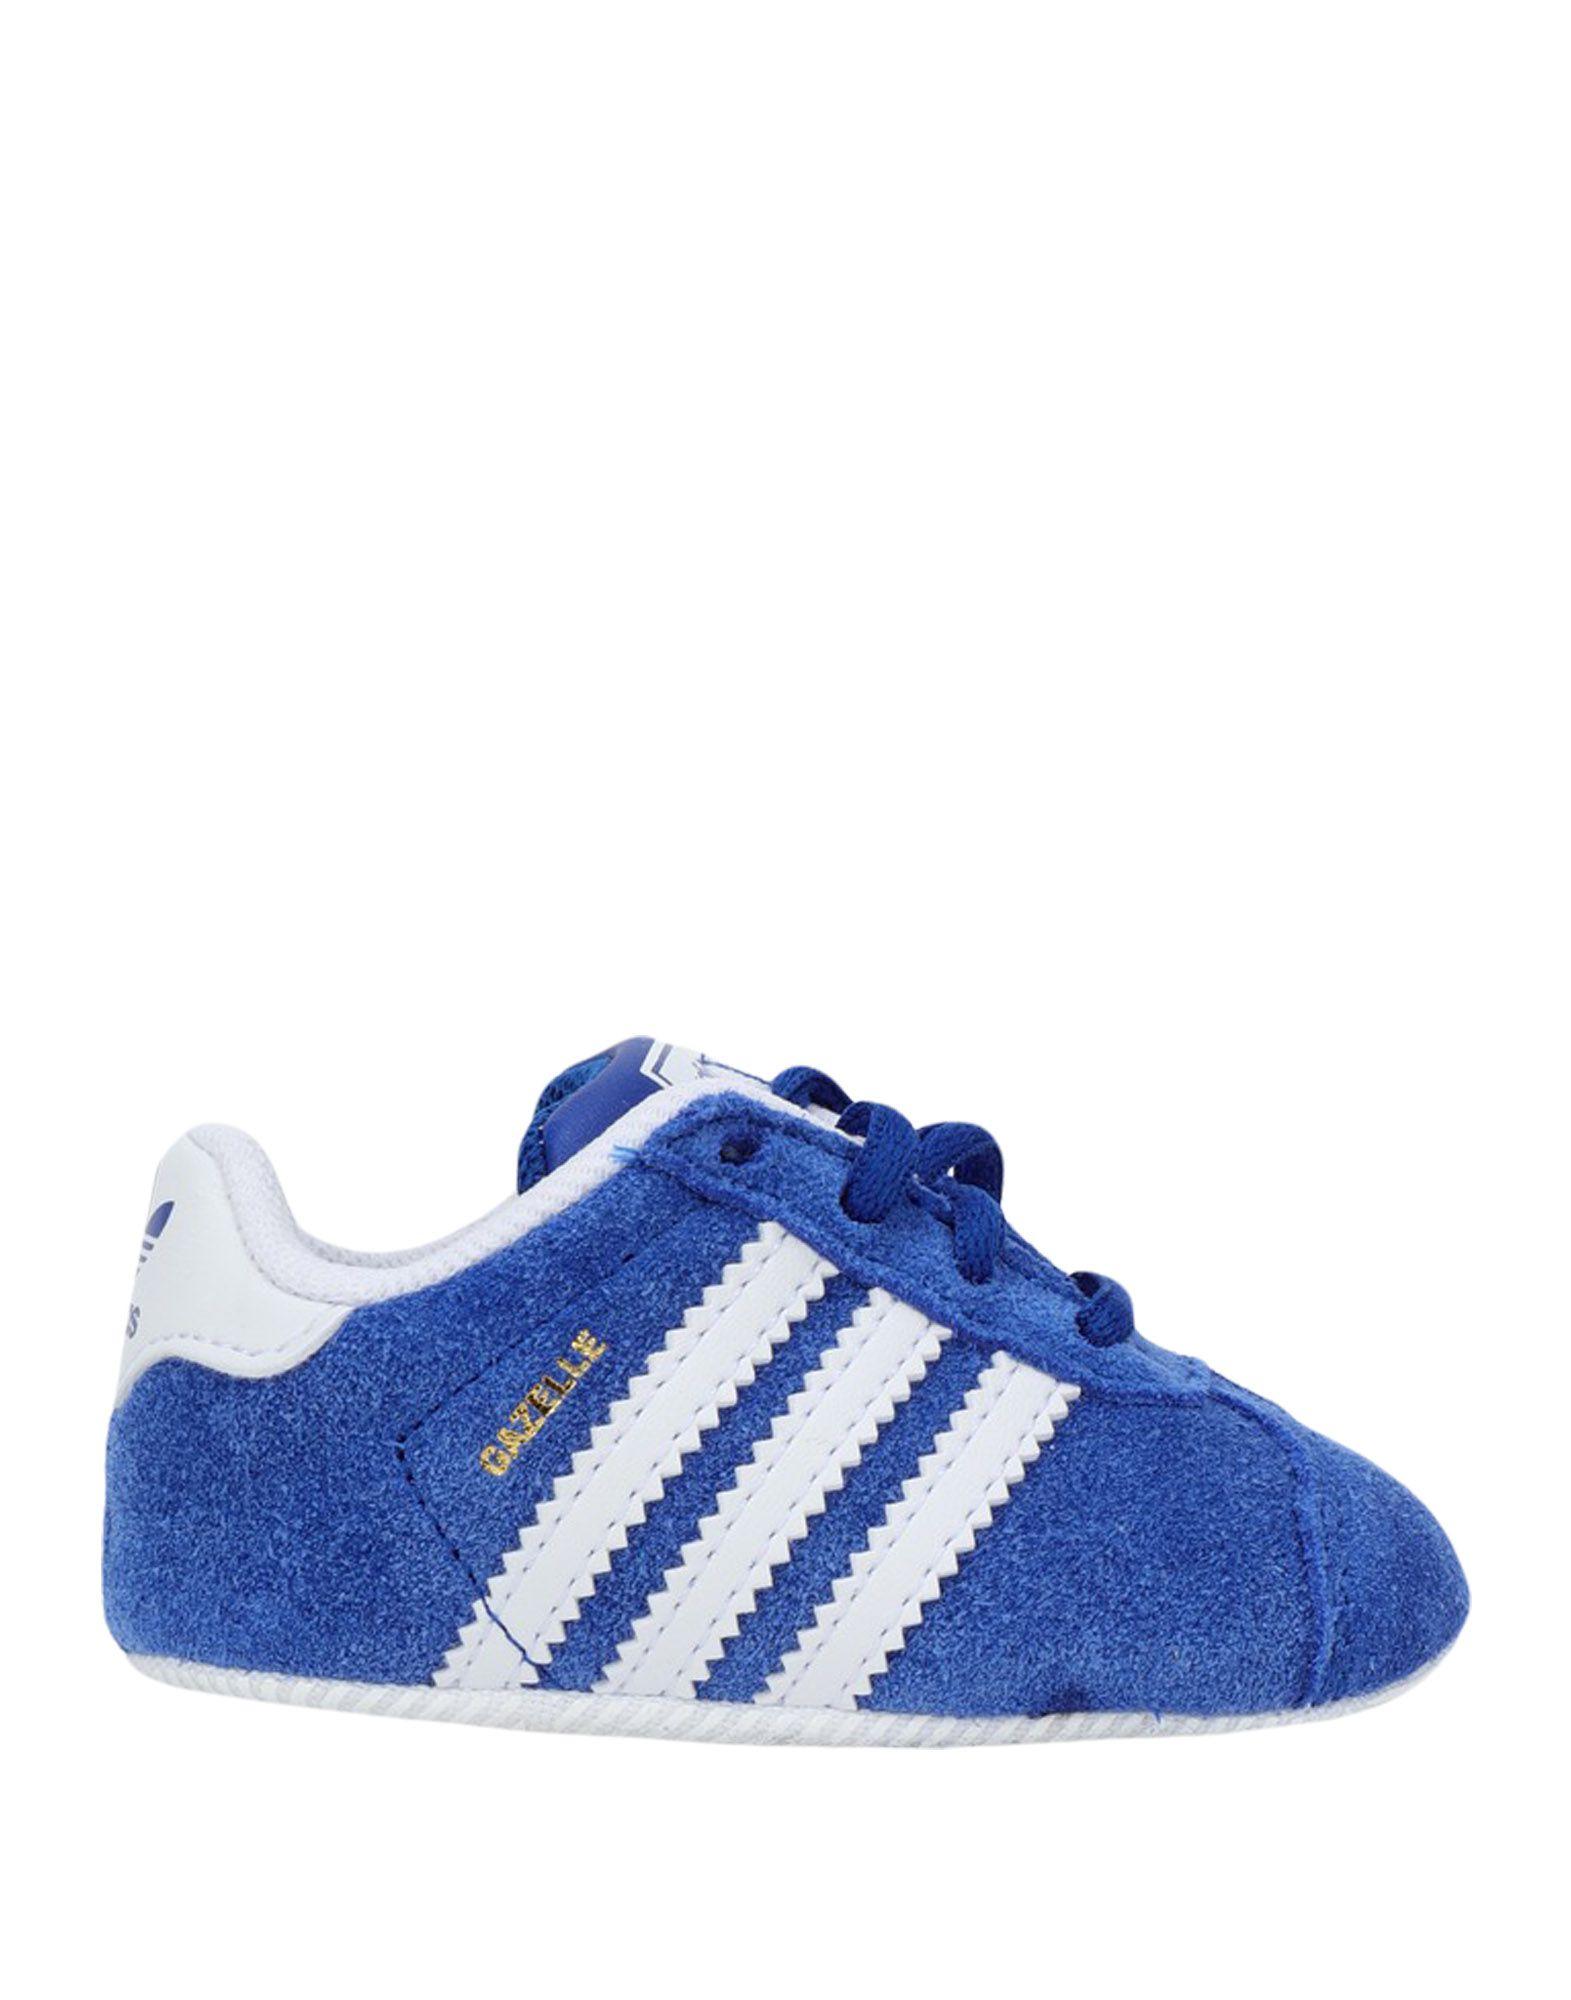 9f261f2f06 Scarpe Neonato Adidas Originals Bambina 0-24 mesi - Acquista online su YOOX